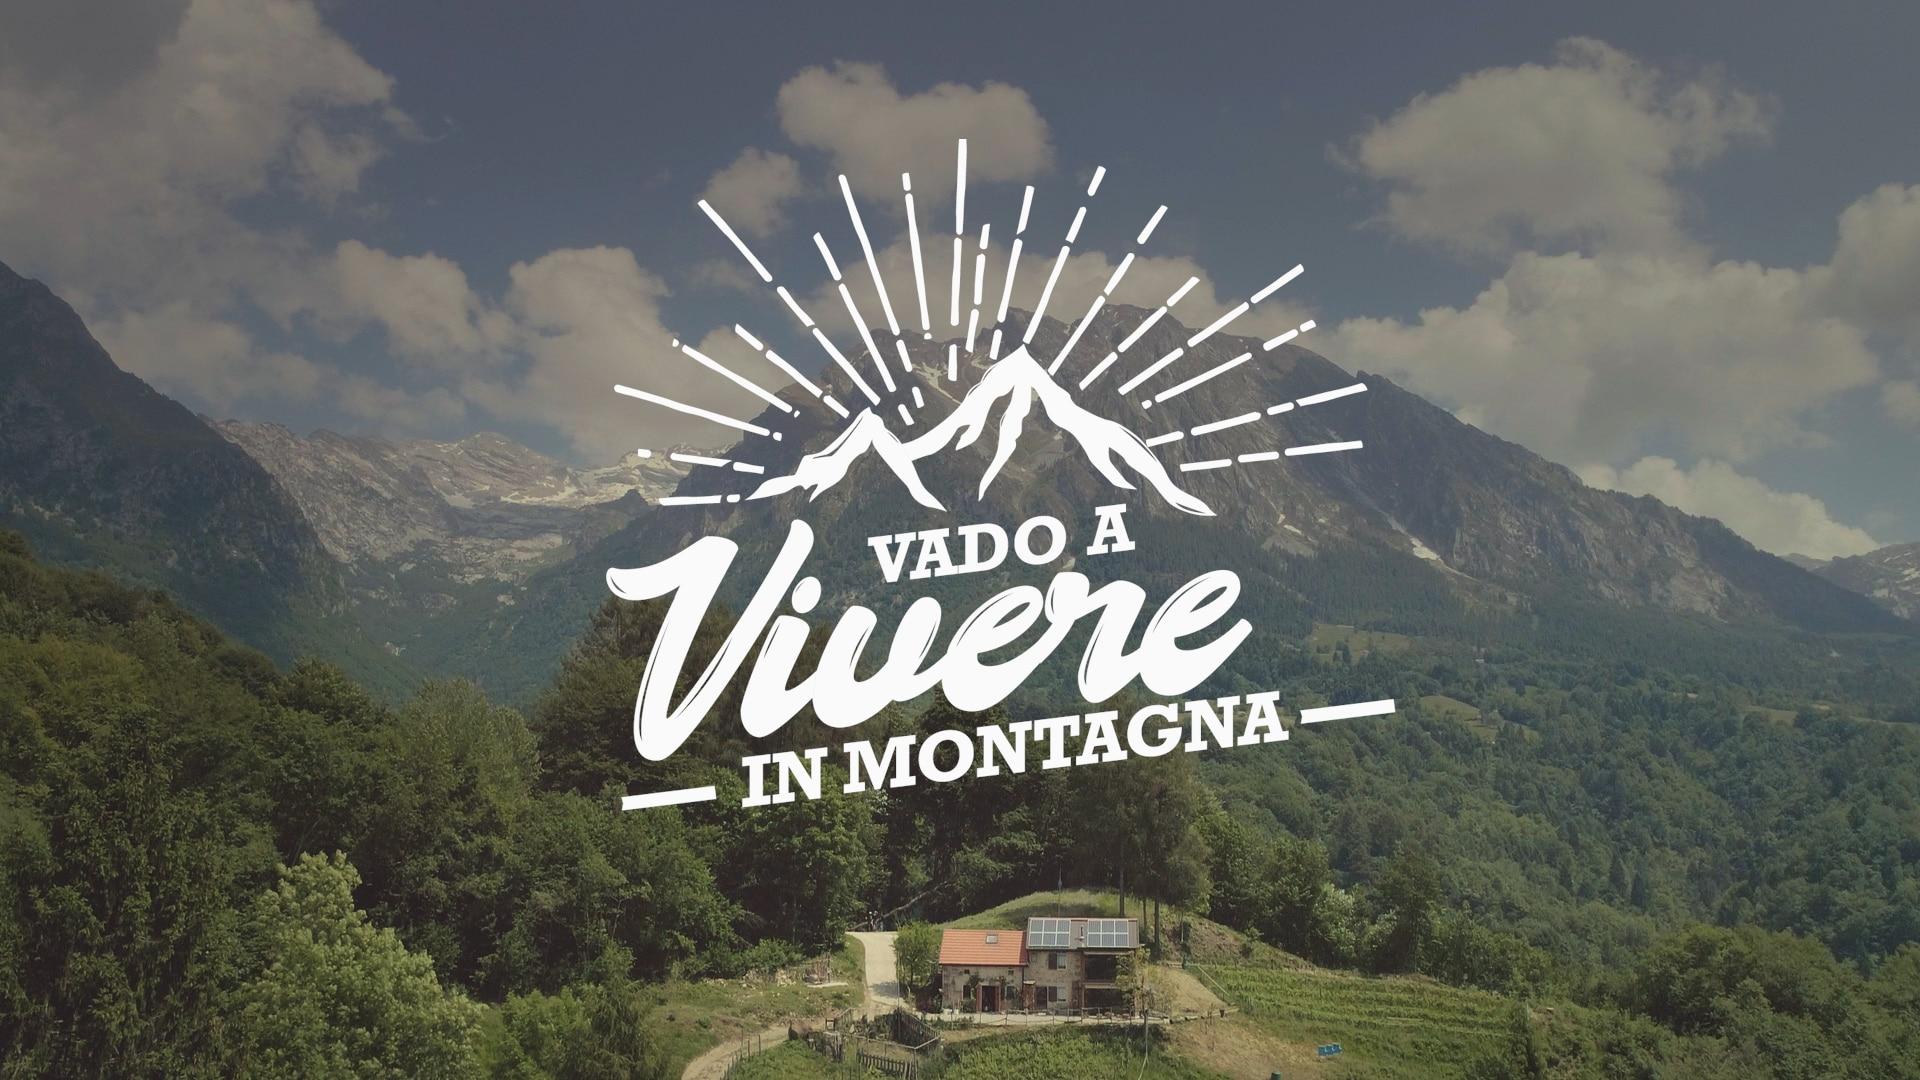 reality, vado a vivere in montagna